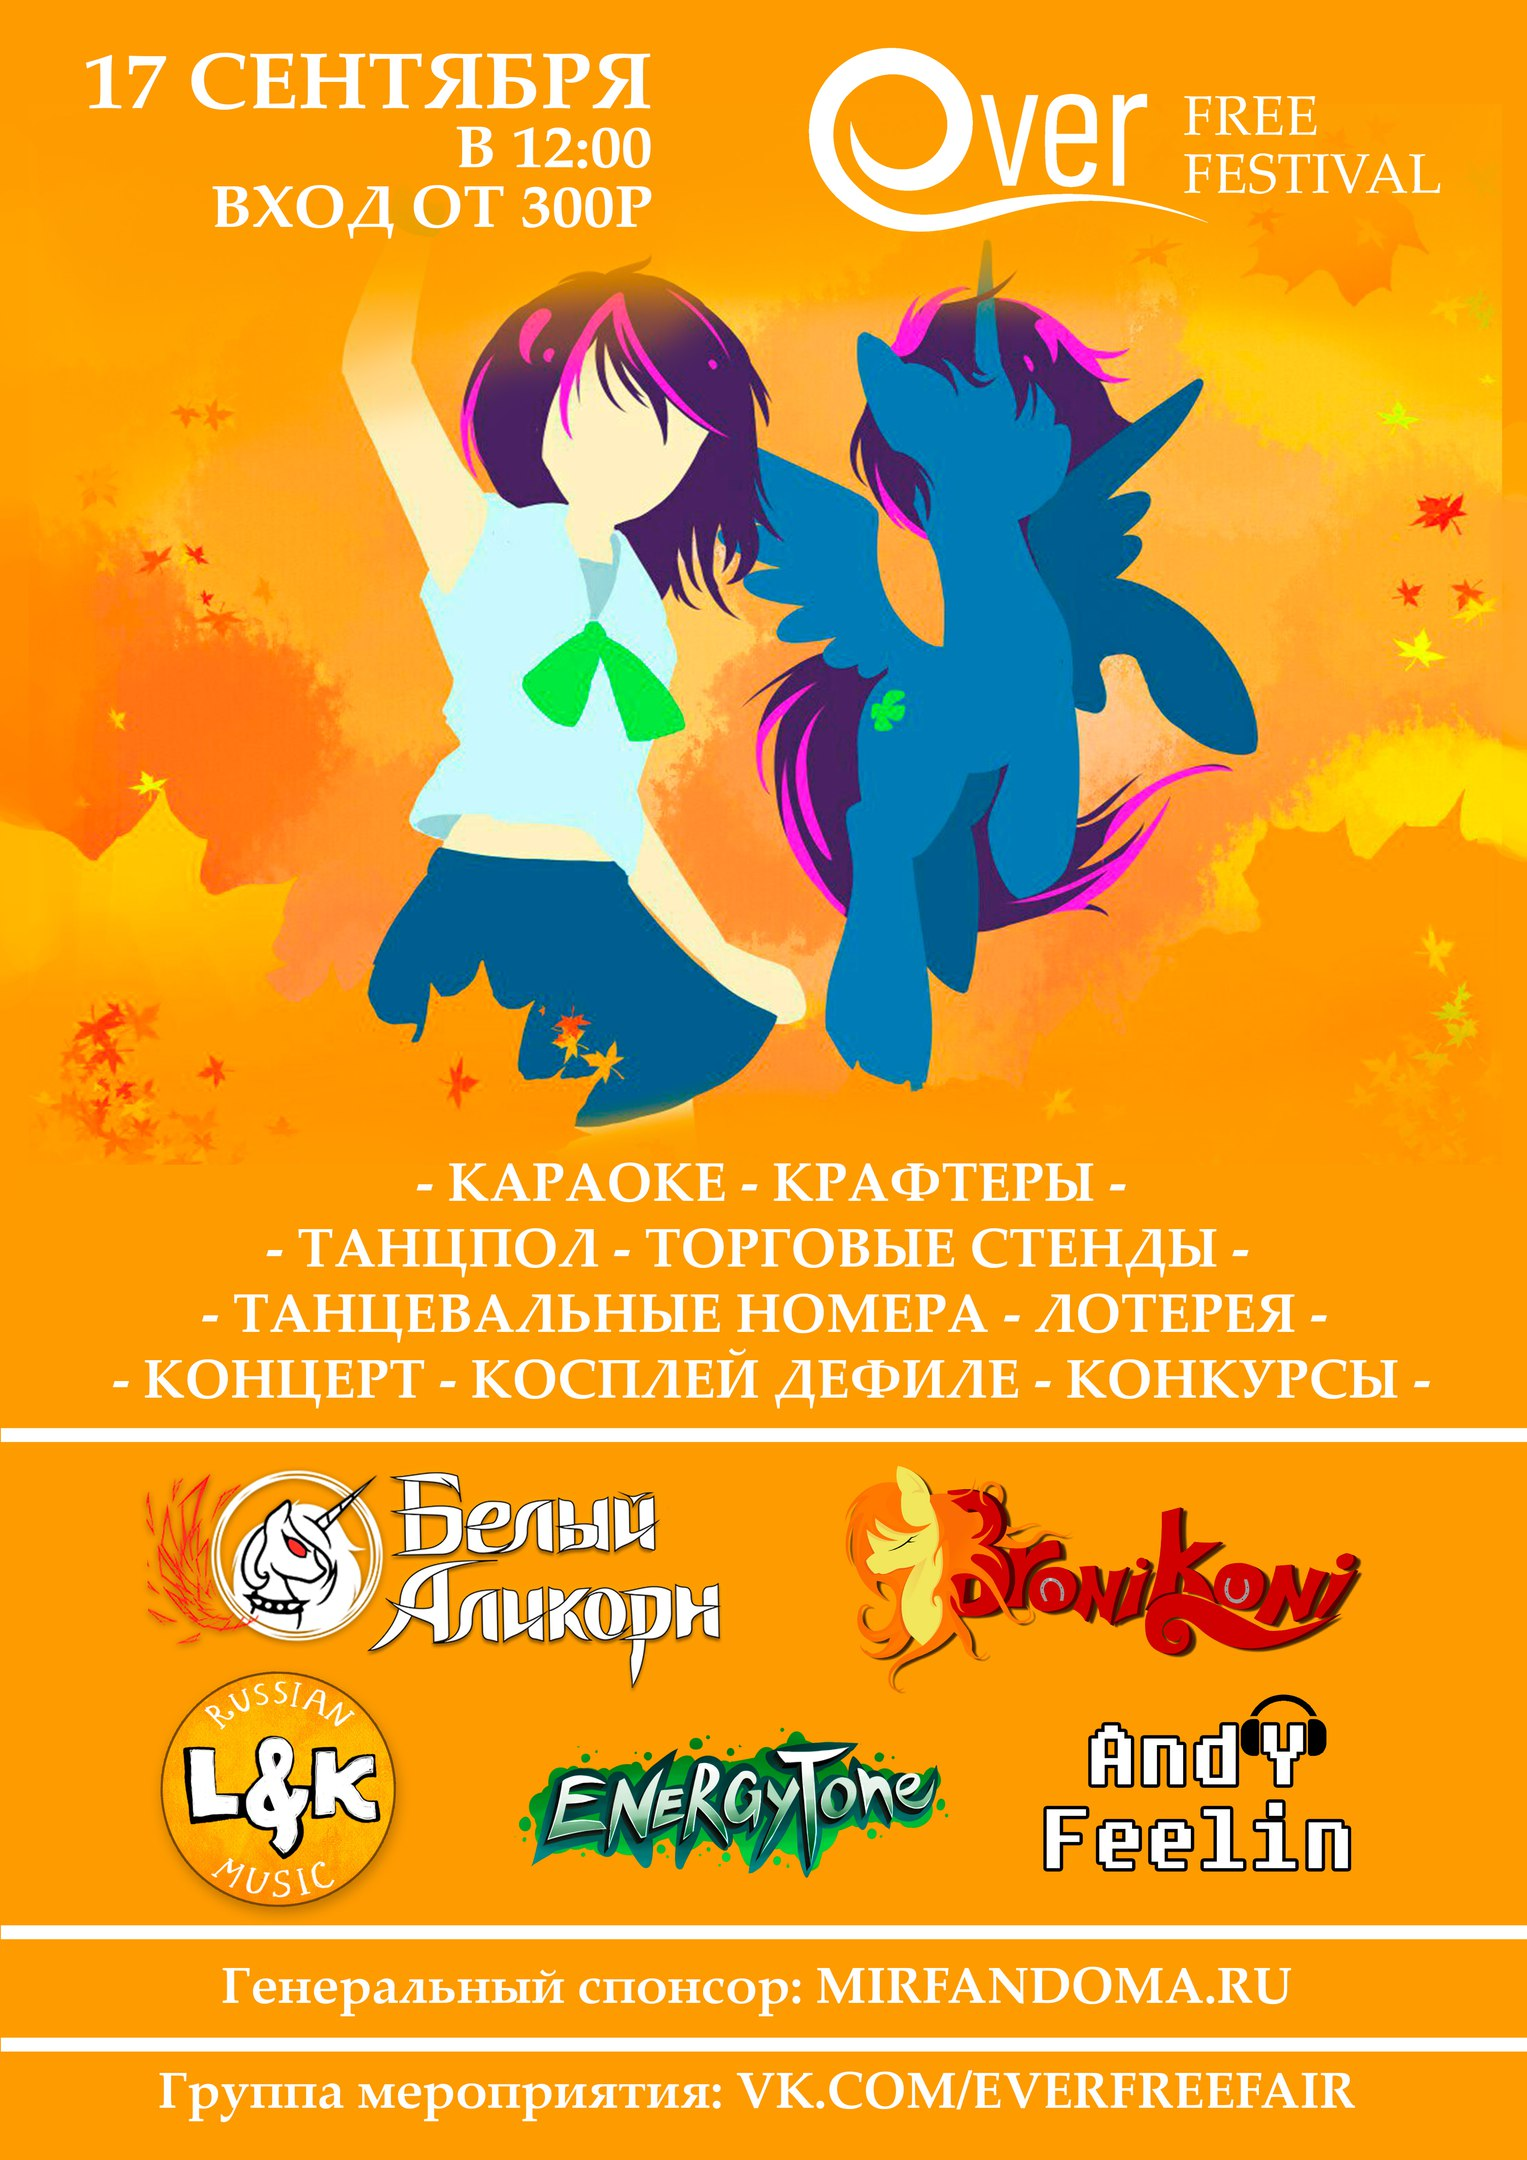 Мультифандомный фестиваль EverFree - Москва